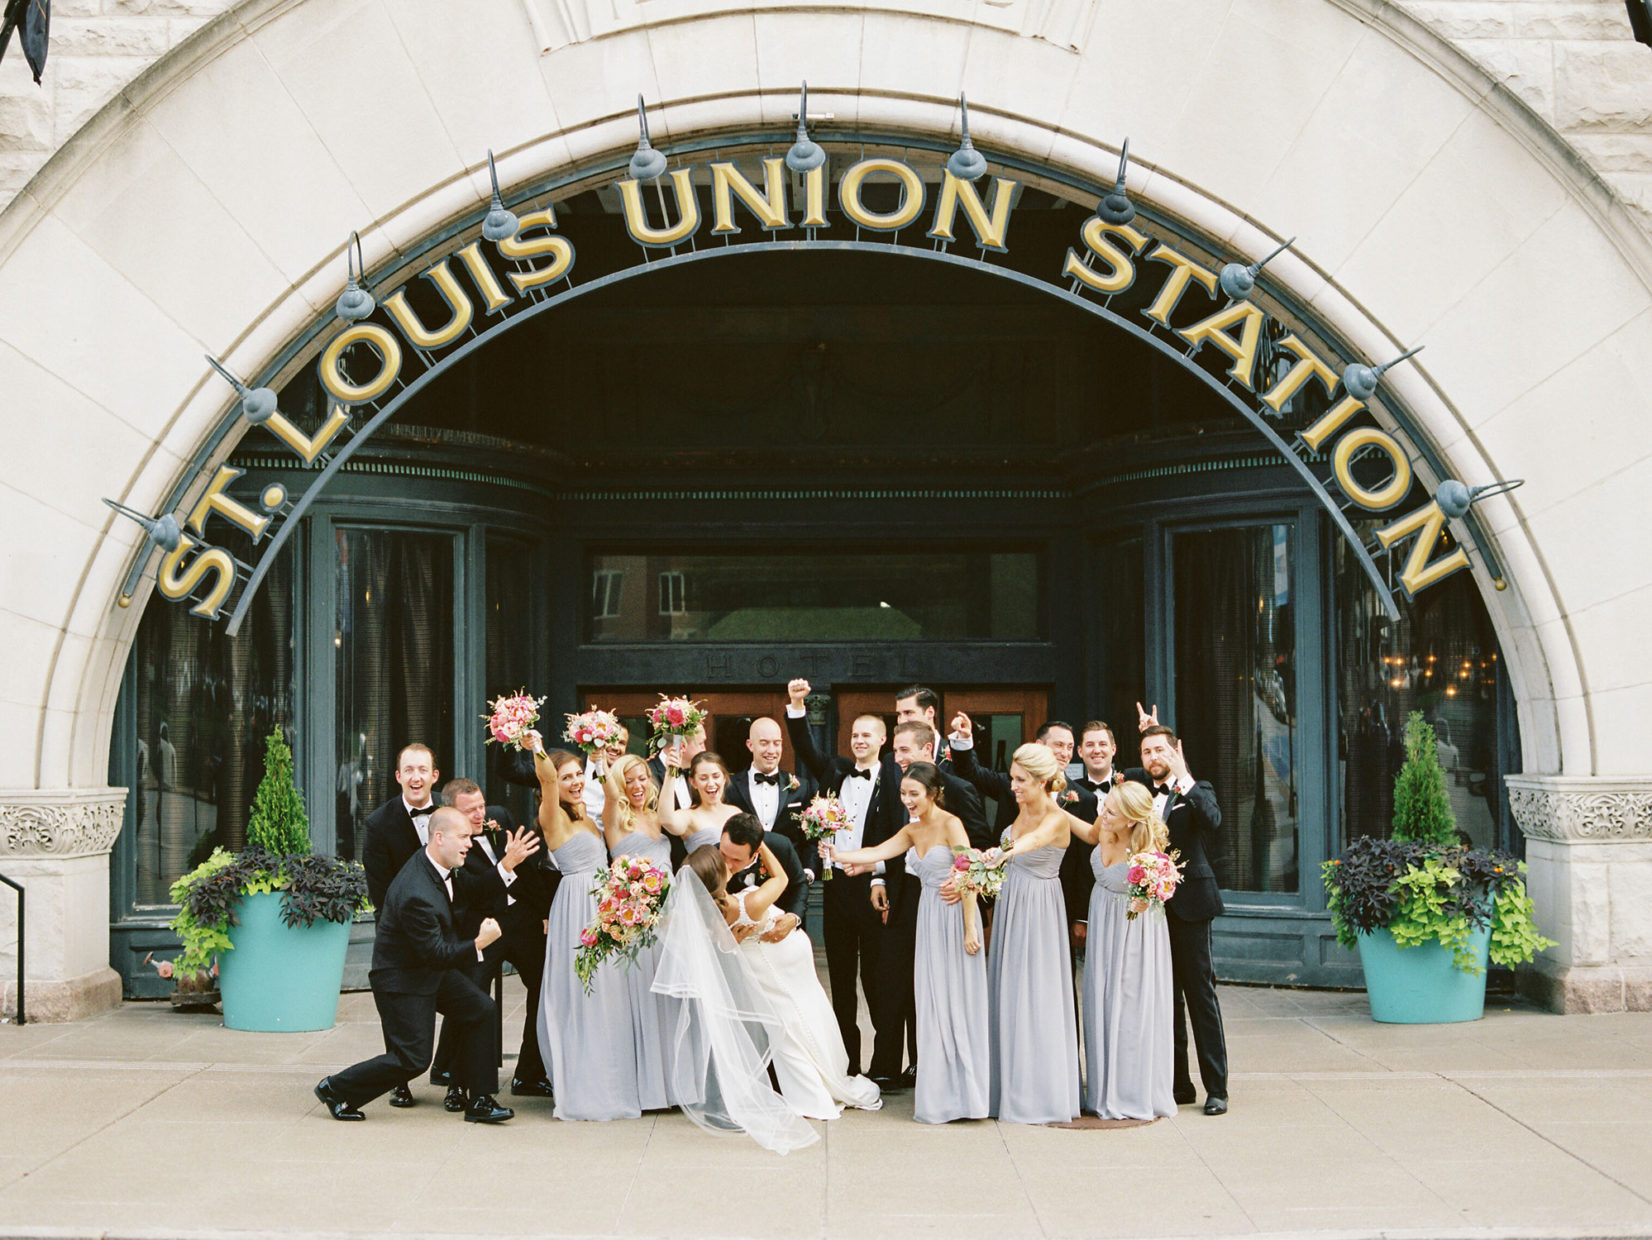 st louis union station wedding